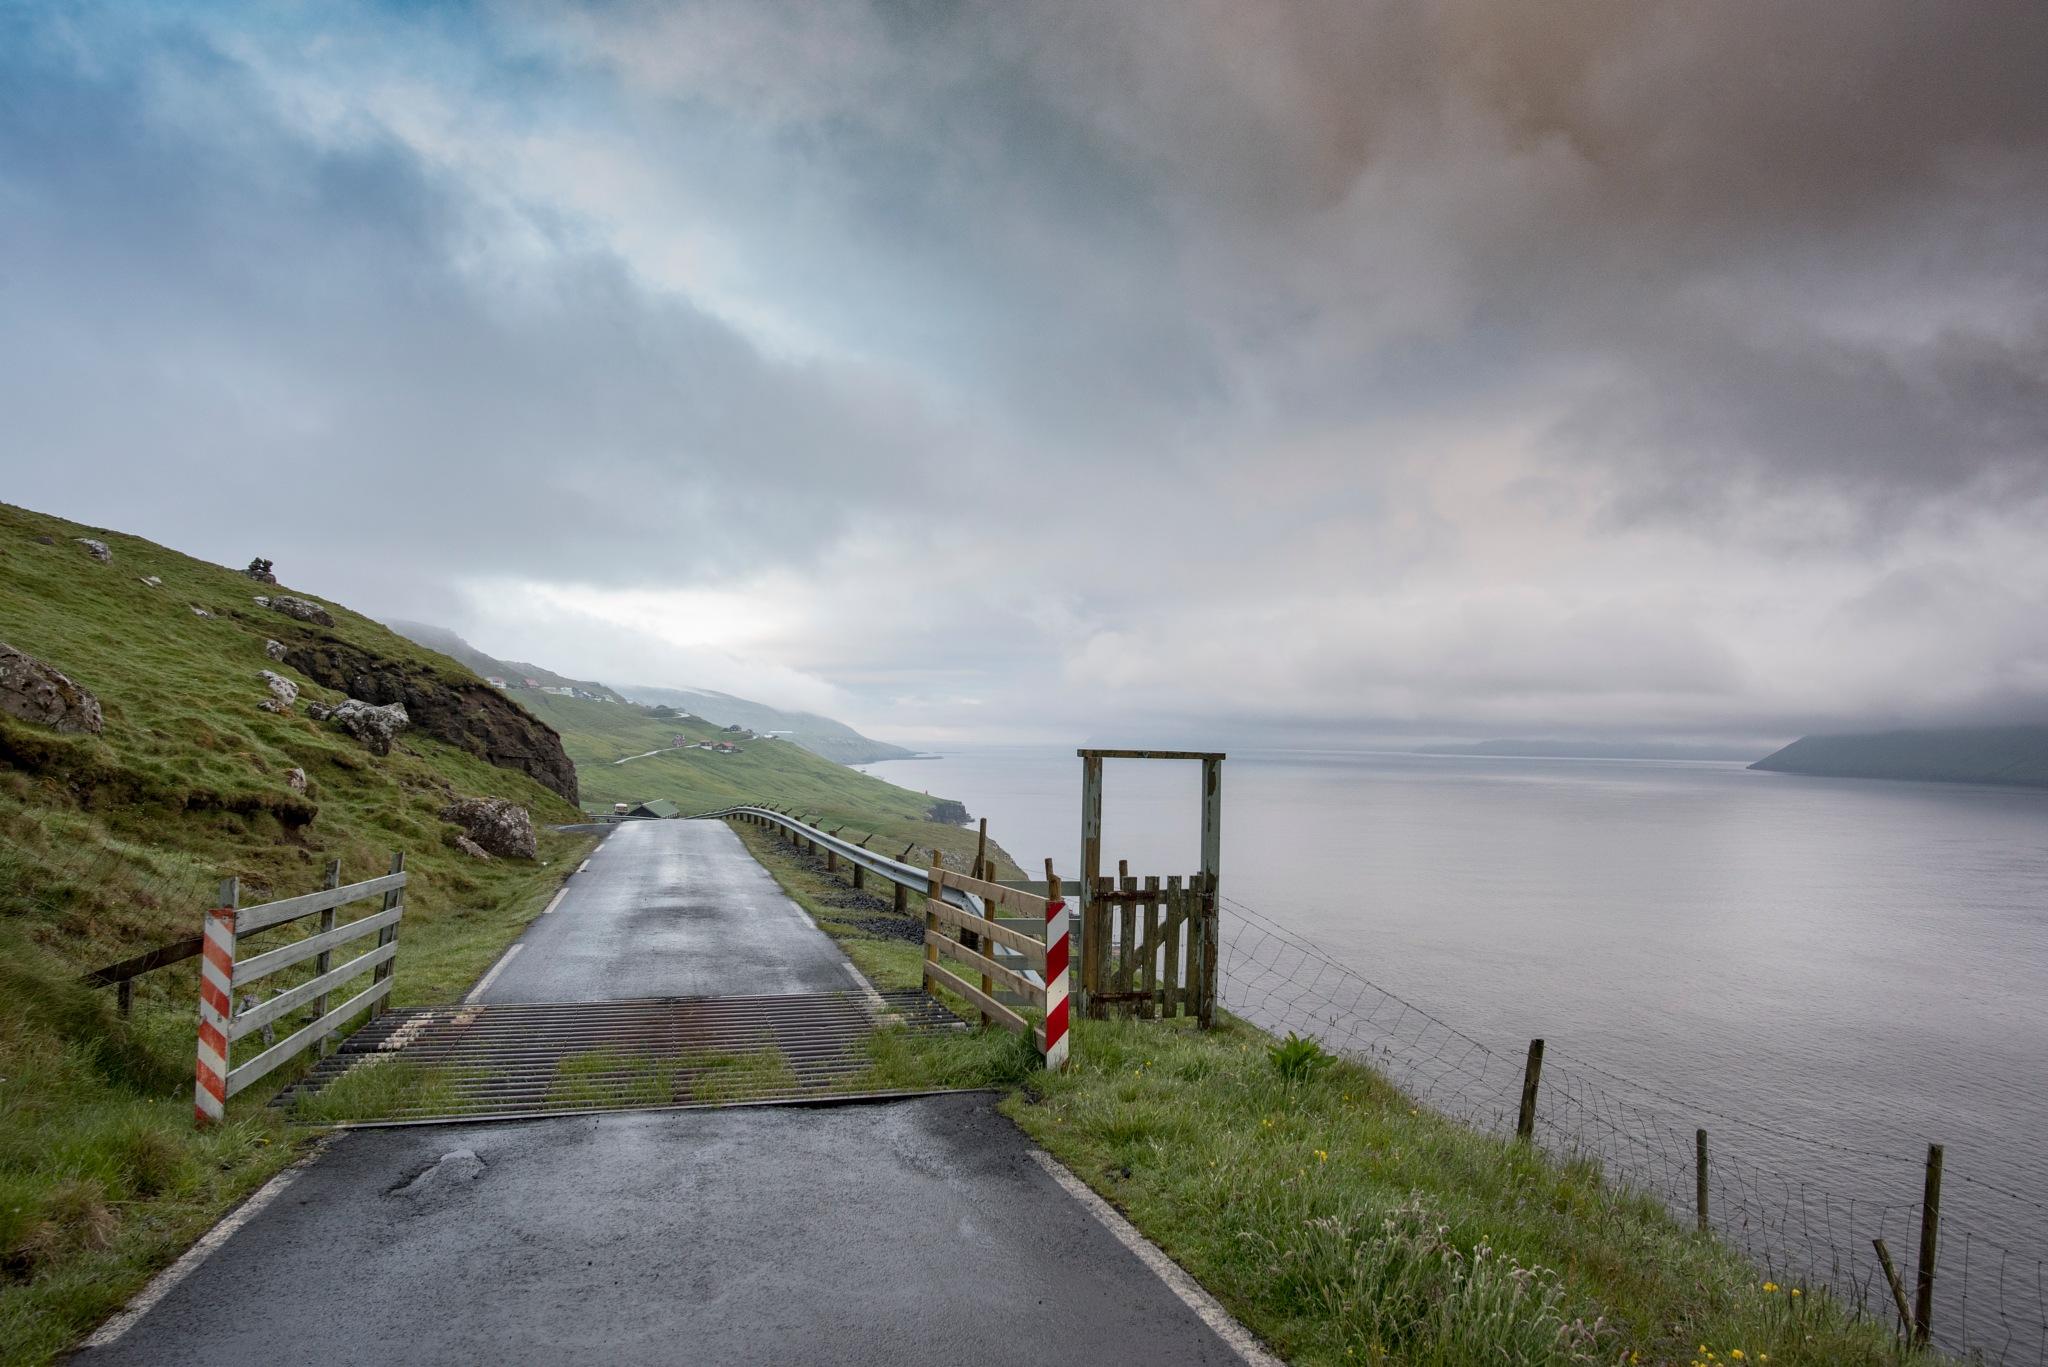 Road to Syðradal by harald bjørgvin